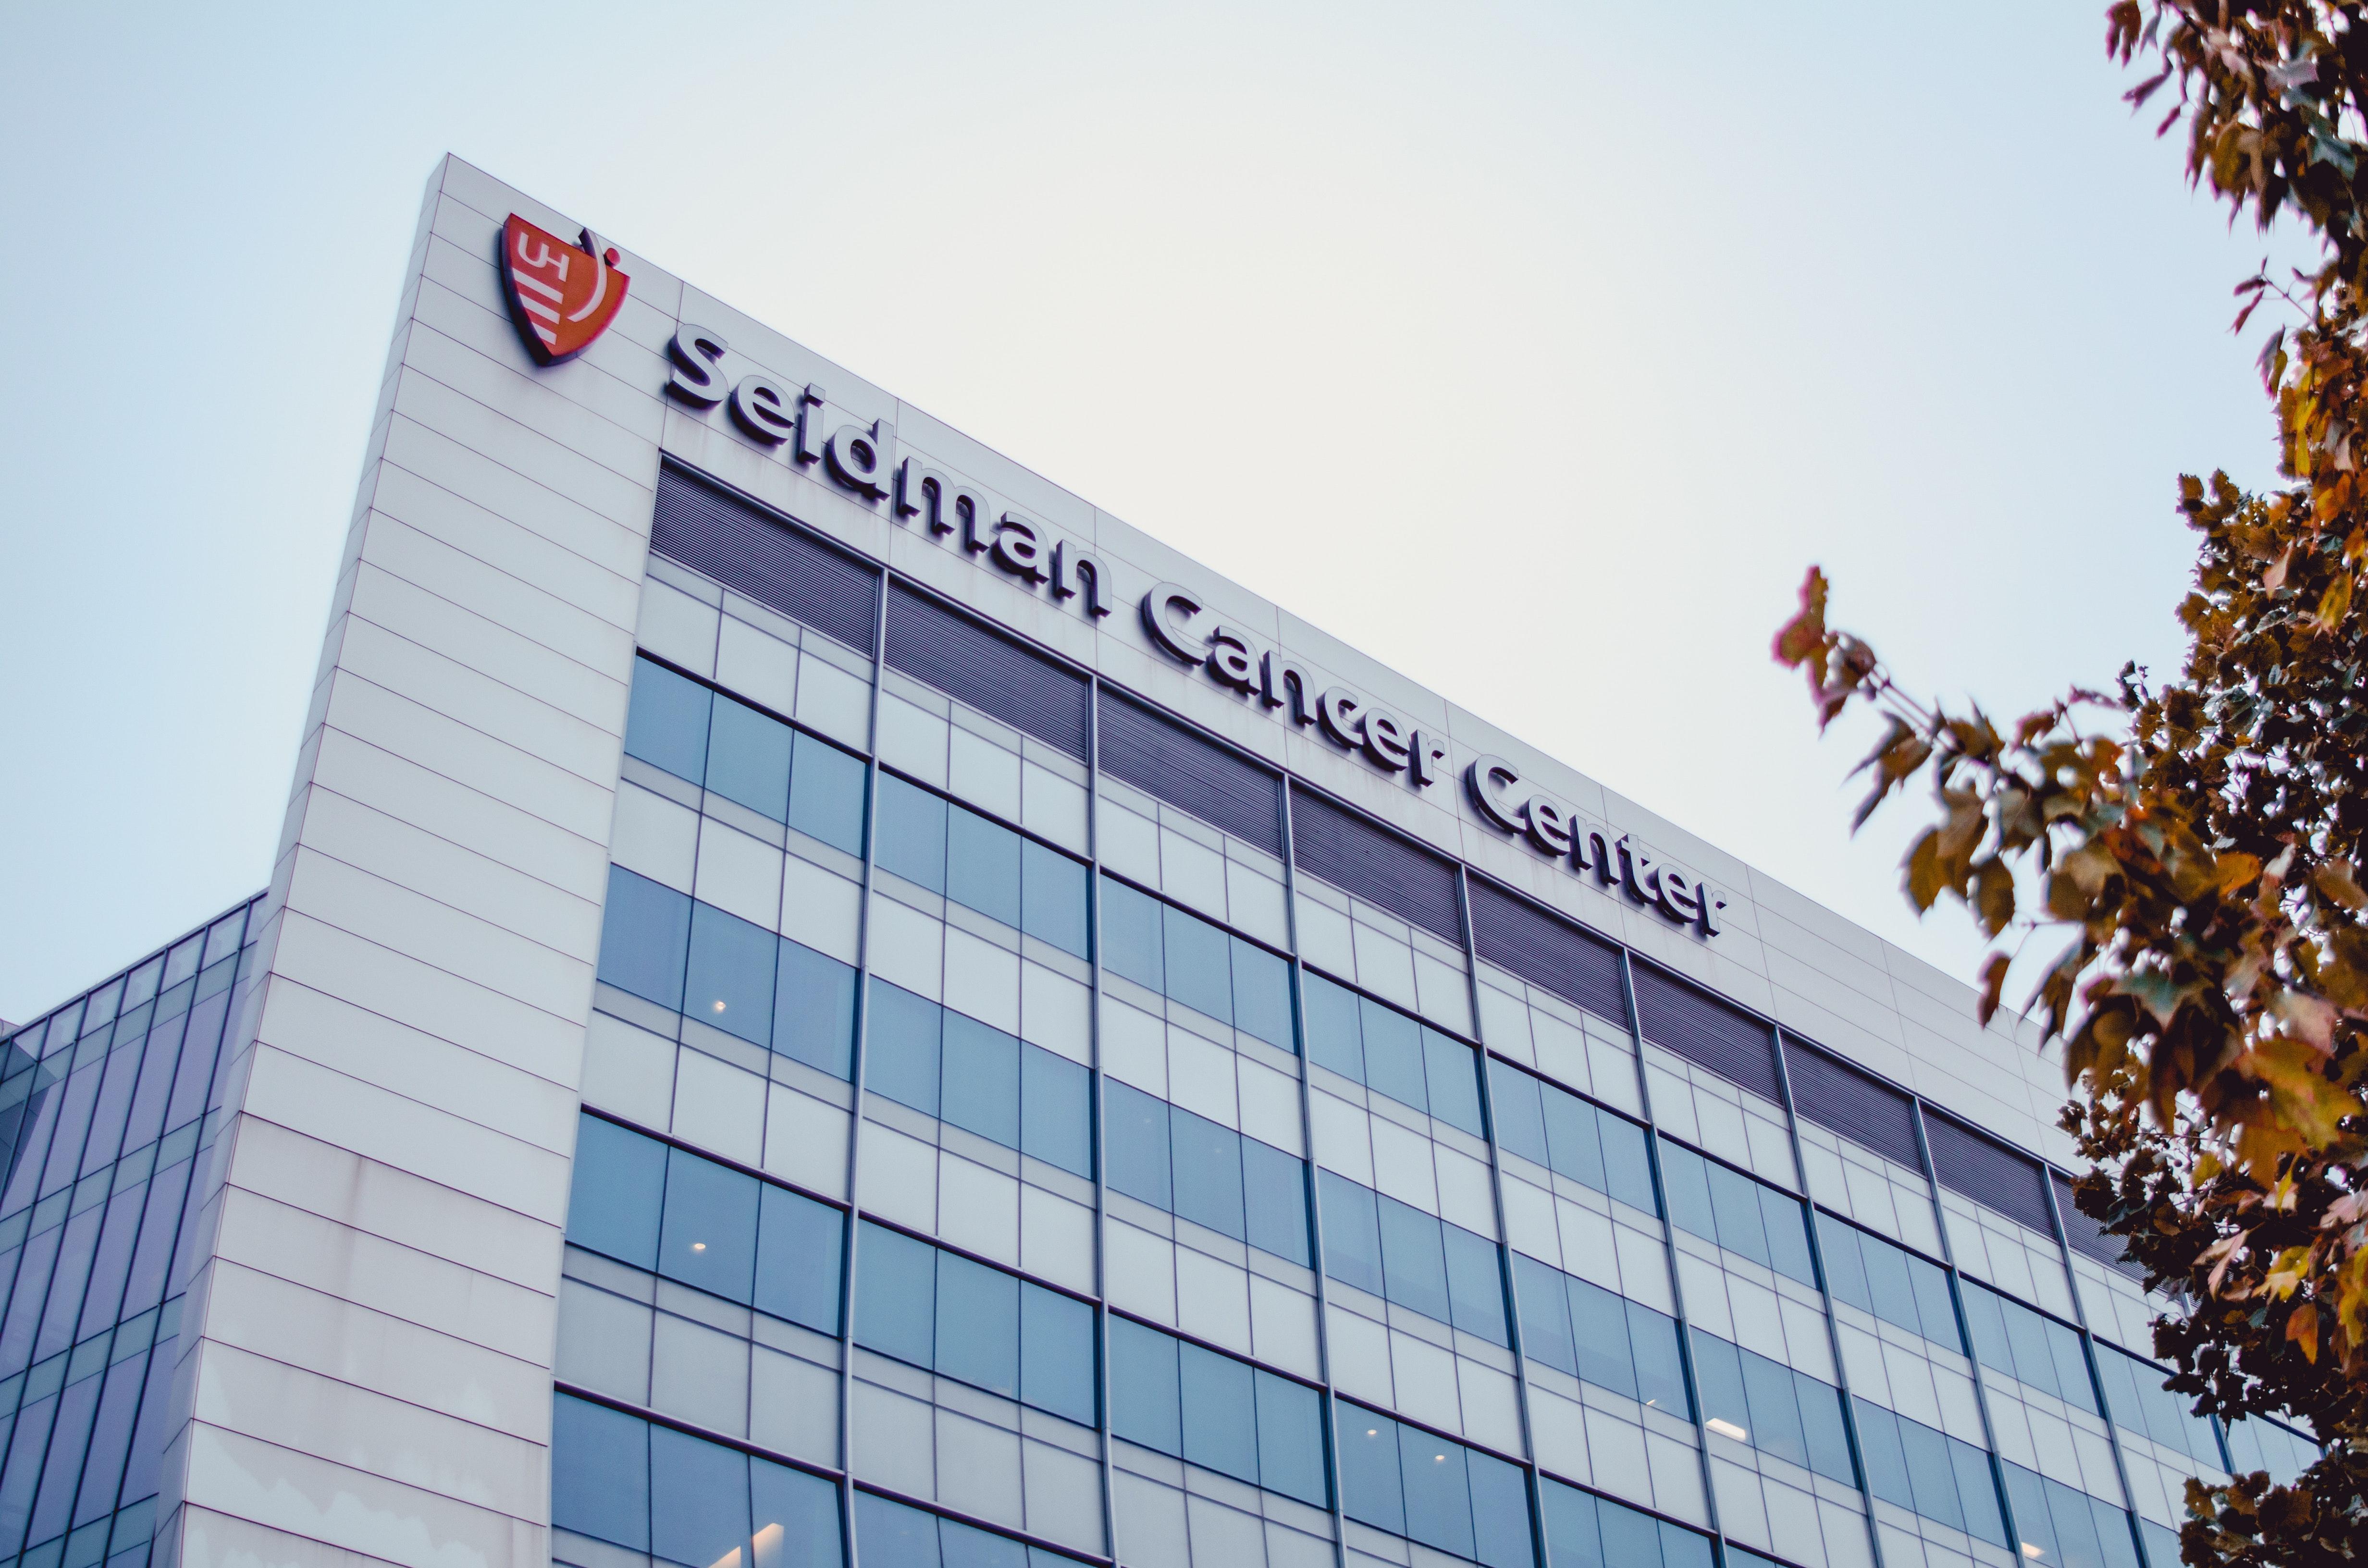 Seidman cancer center building at daytime photo